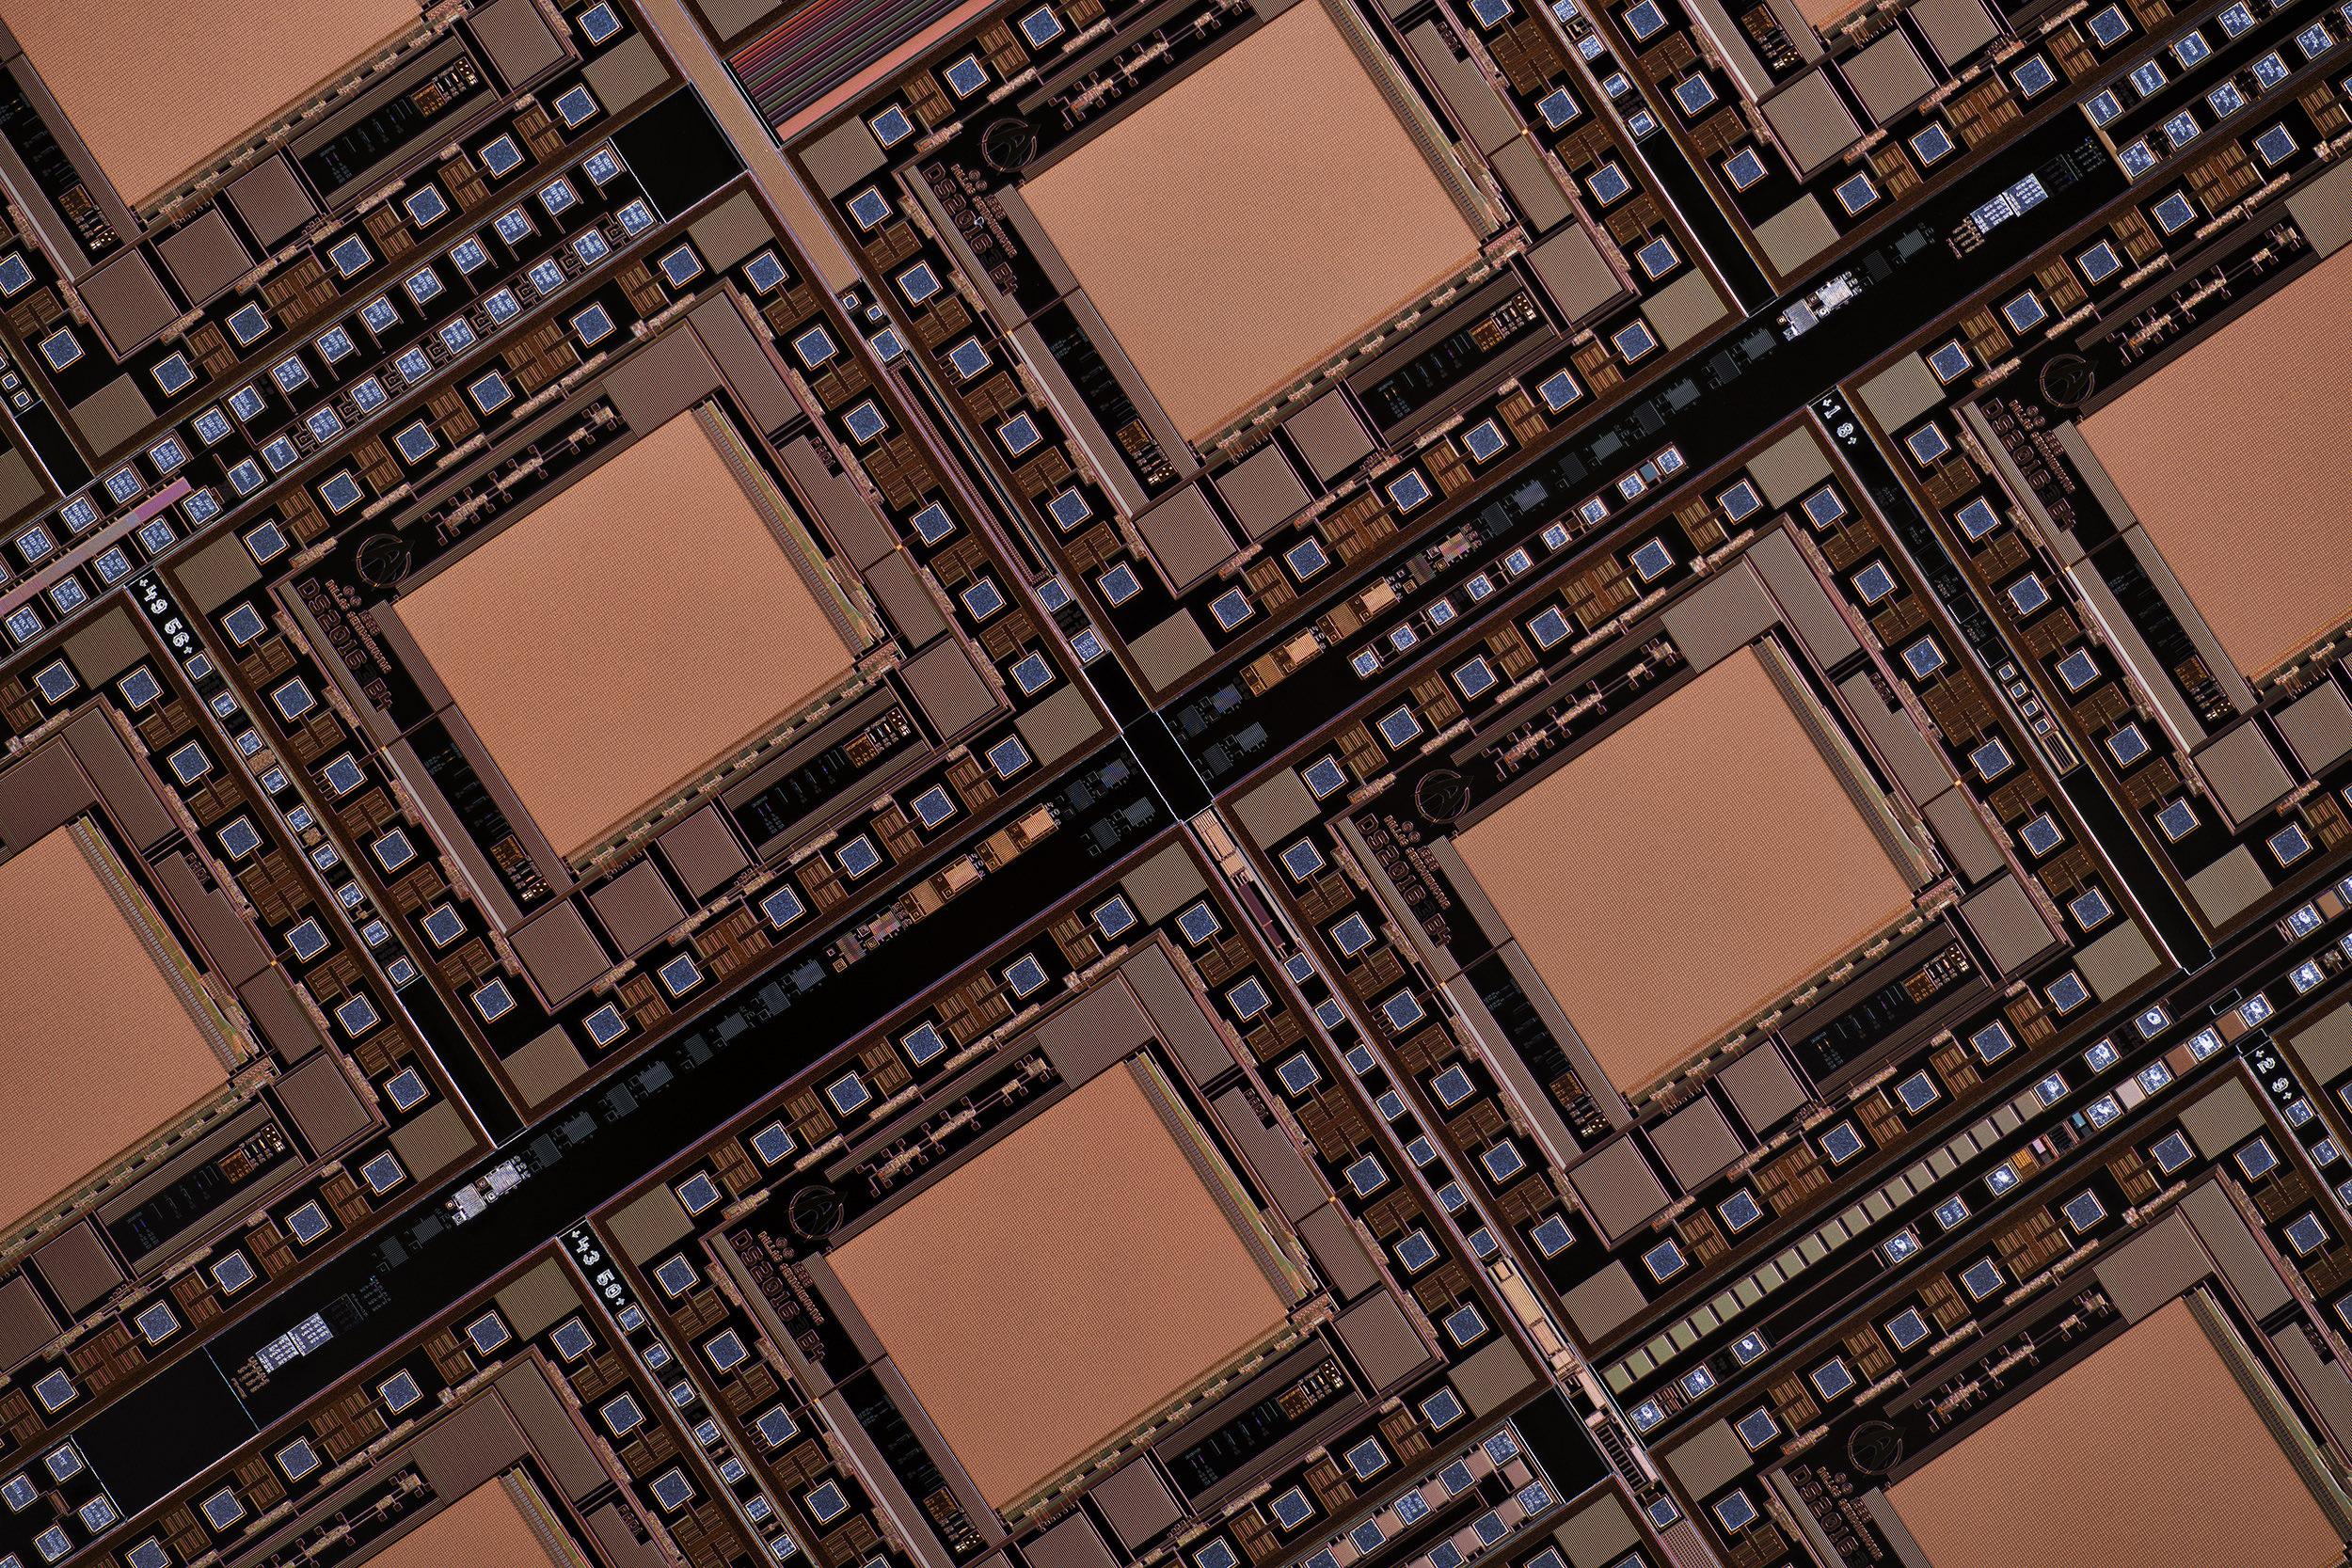 Schneider Kreuznach 2.8/28 Componon lens and Mejiro 5.6/90 scan lens at 3.2x with the Nikon D850 full frame sensor body